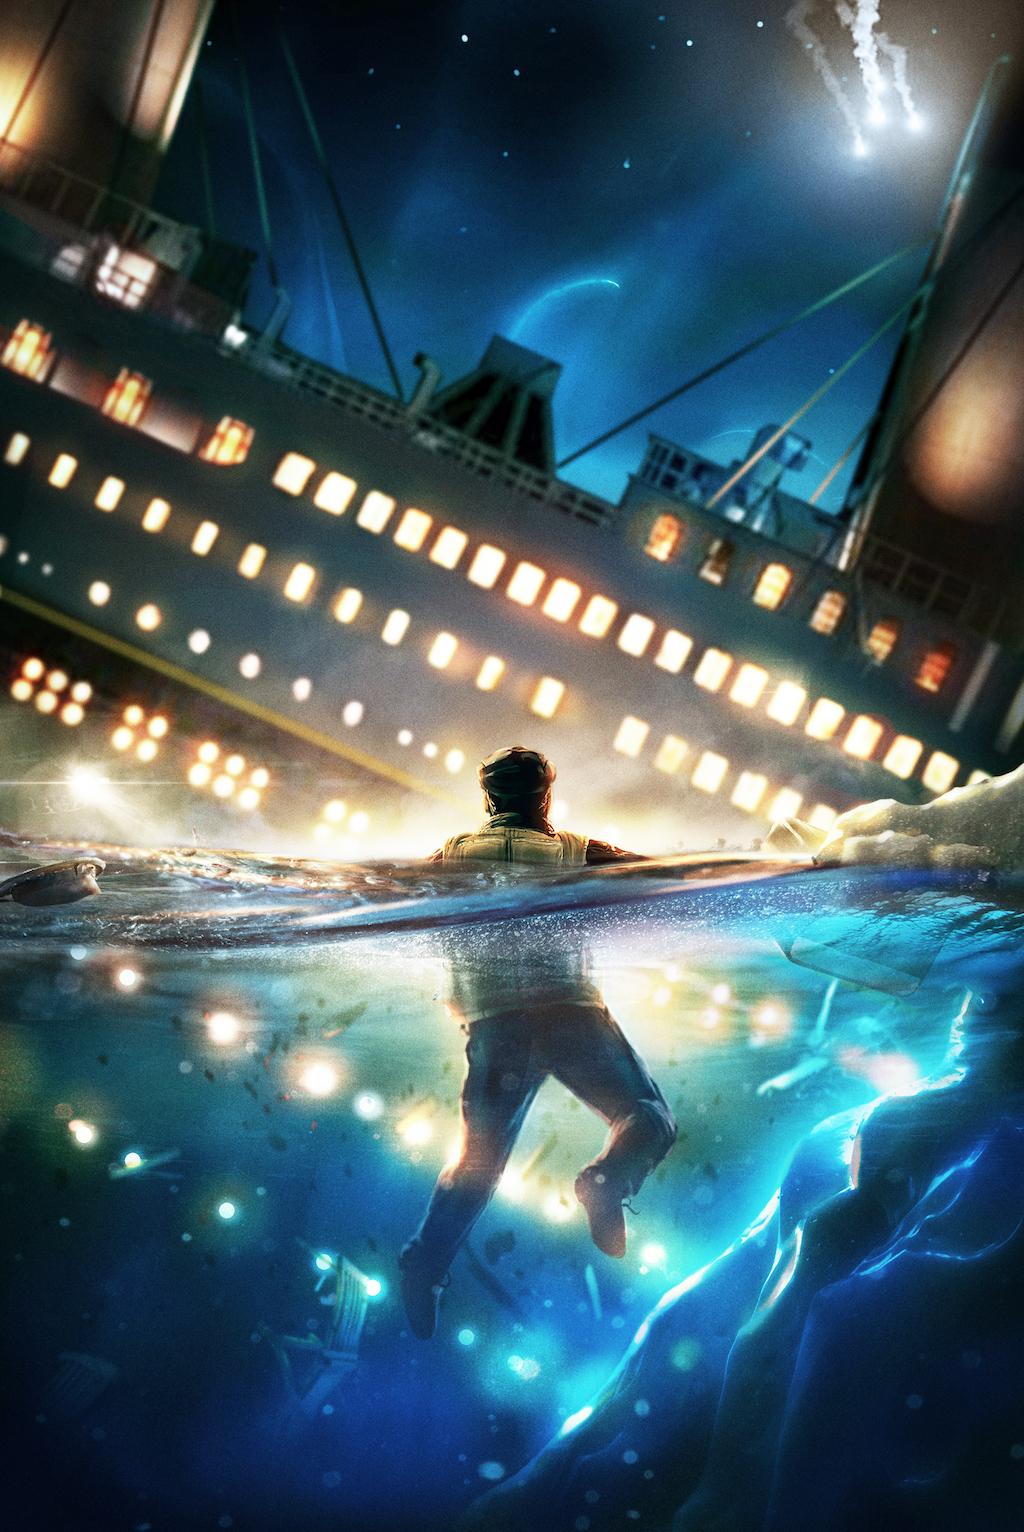 book book cover survivor titanic Pompeii scholastic non-fiction first-hand account Jim Eldridge Stephen Davies